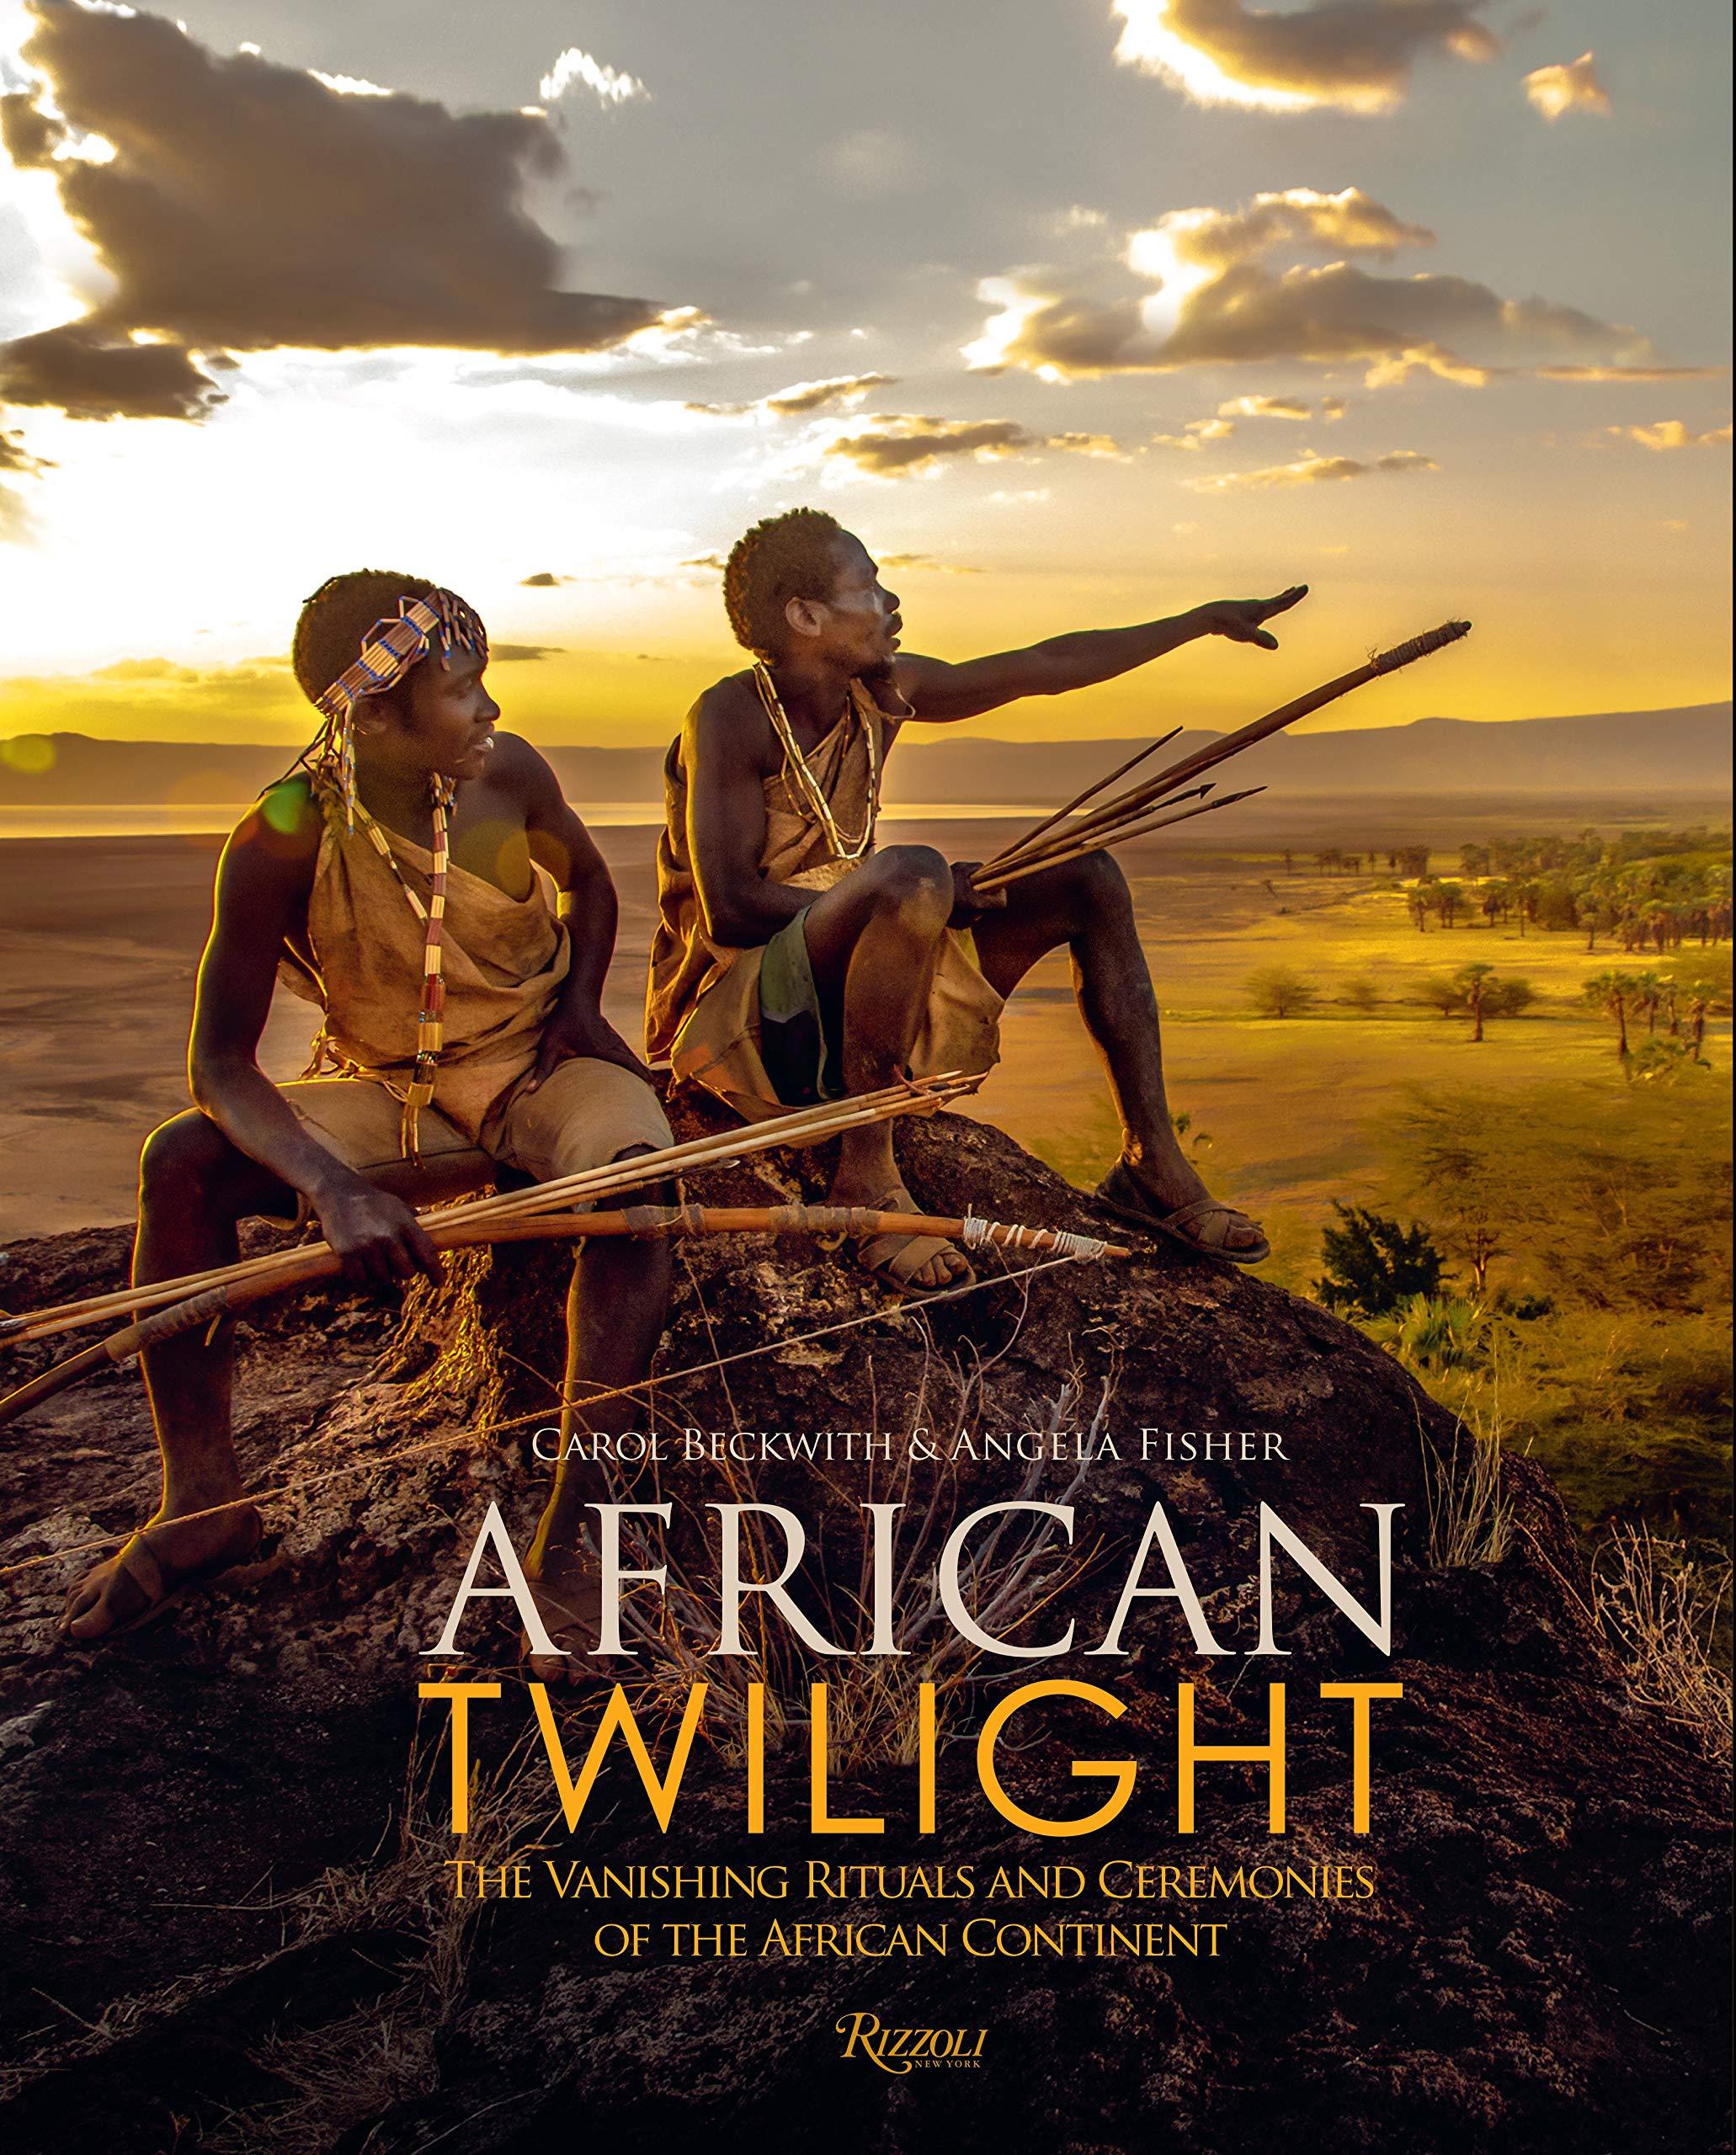 African Twilight: The Vanishing Rituals and Ceremonies of